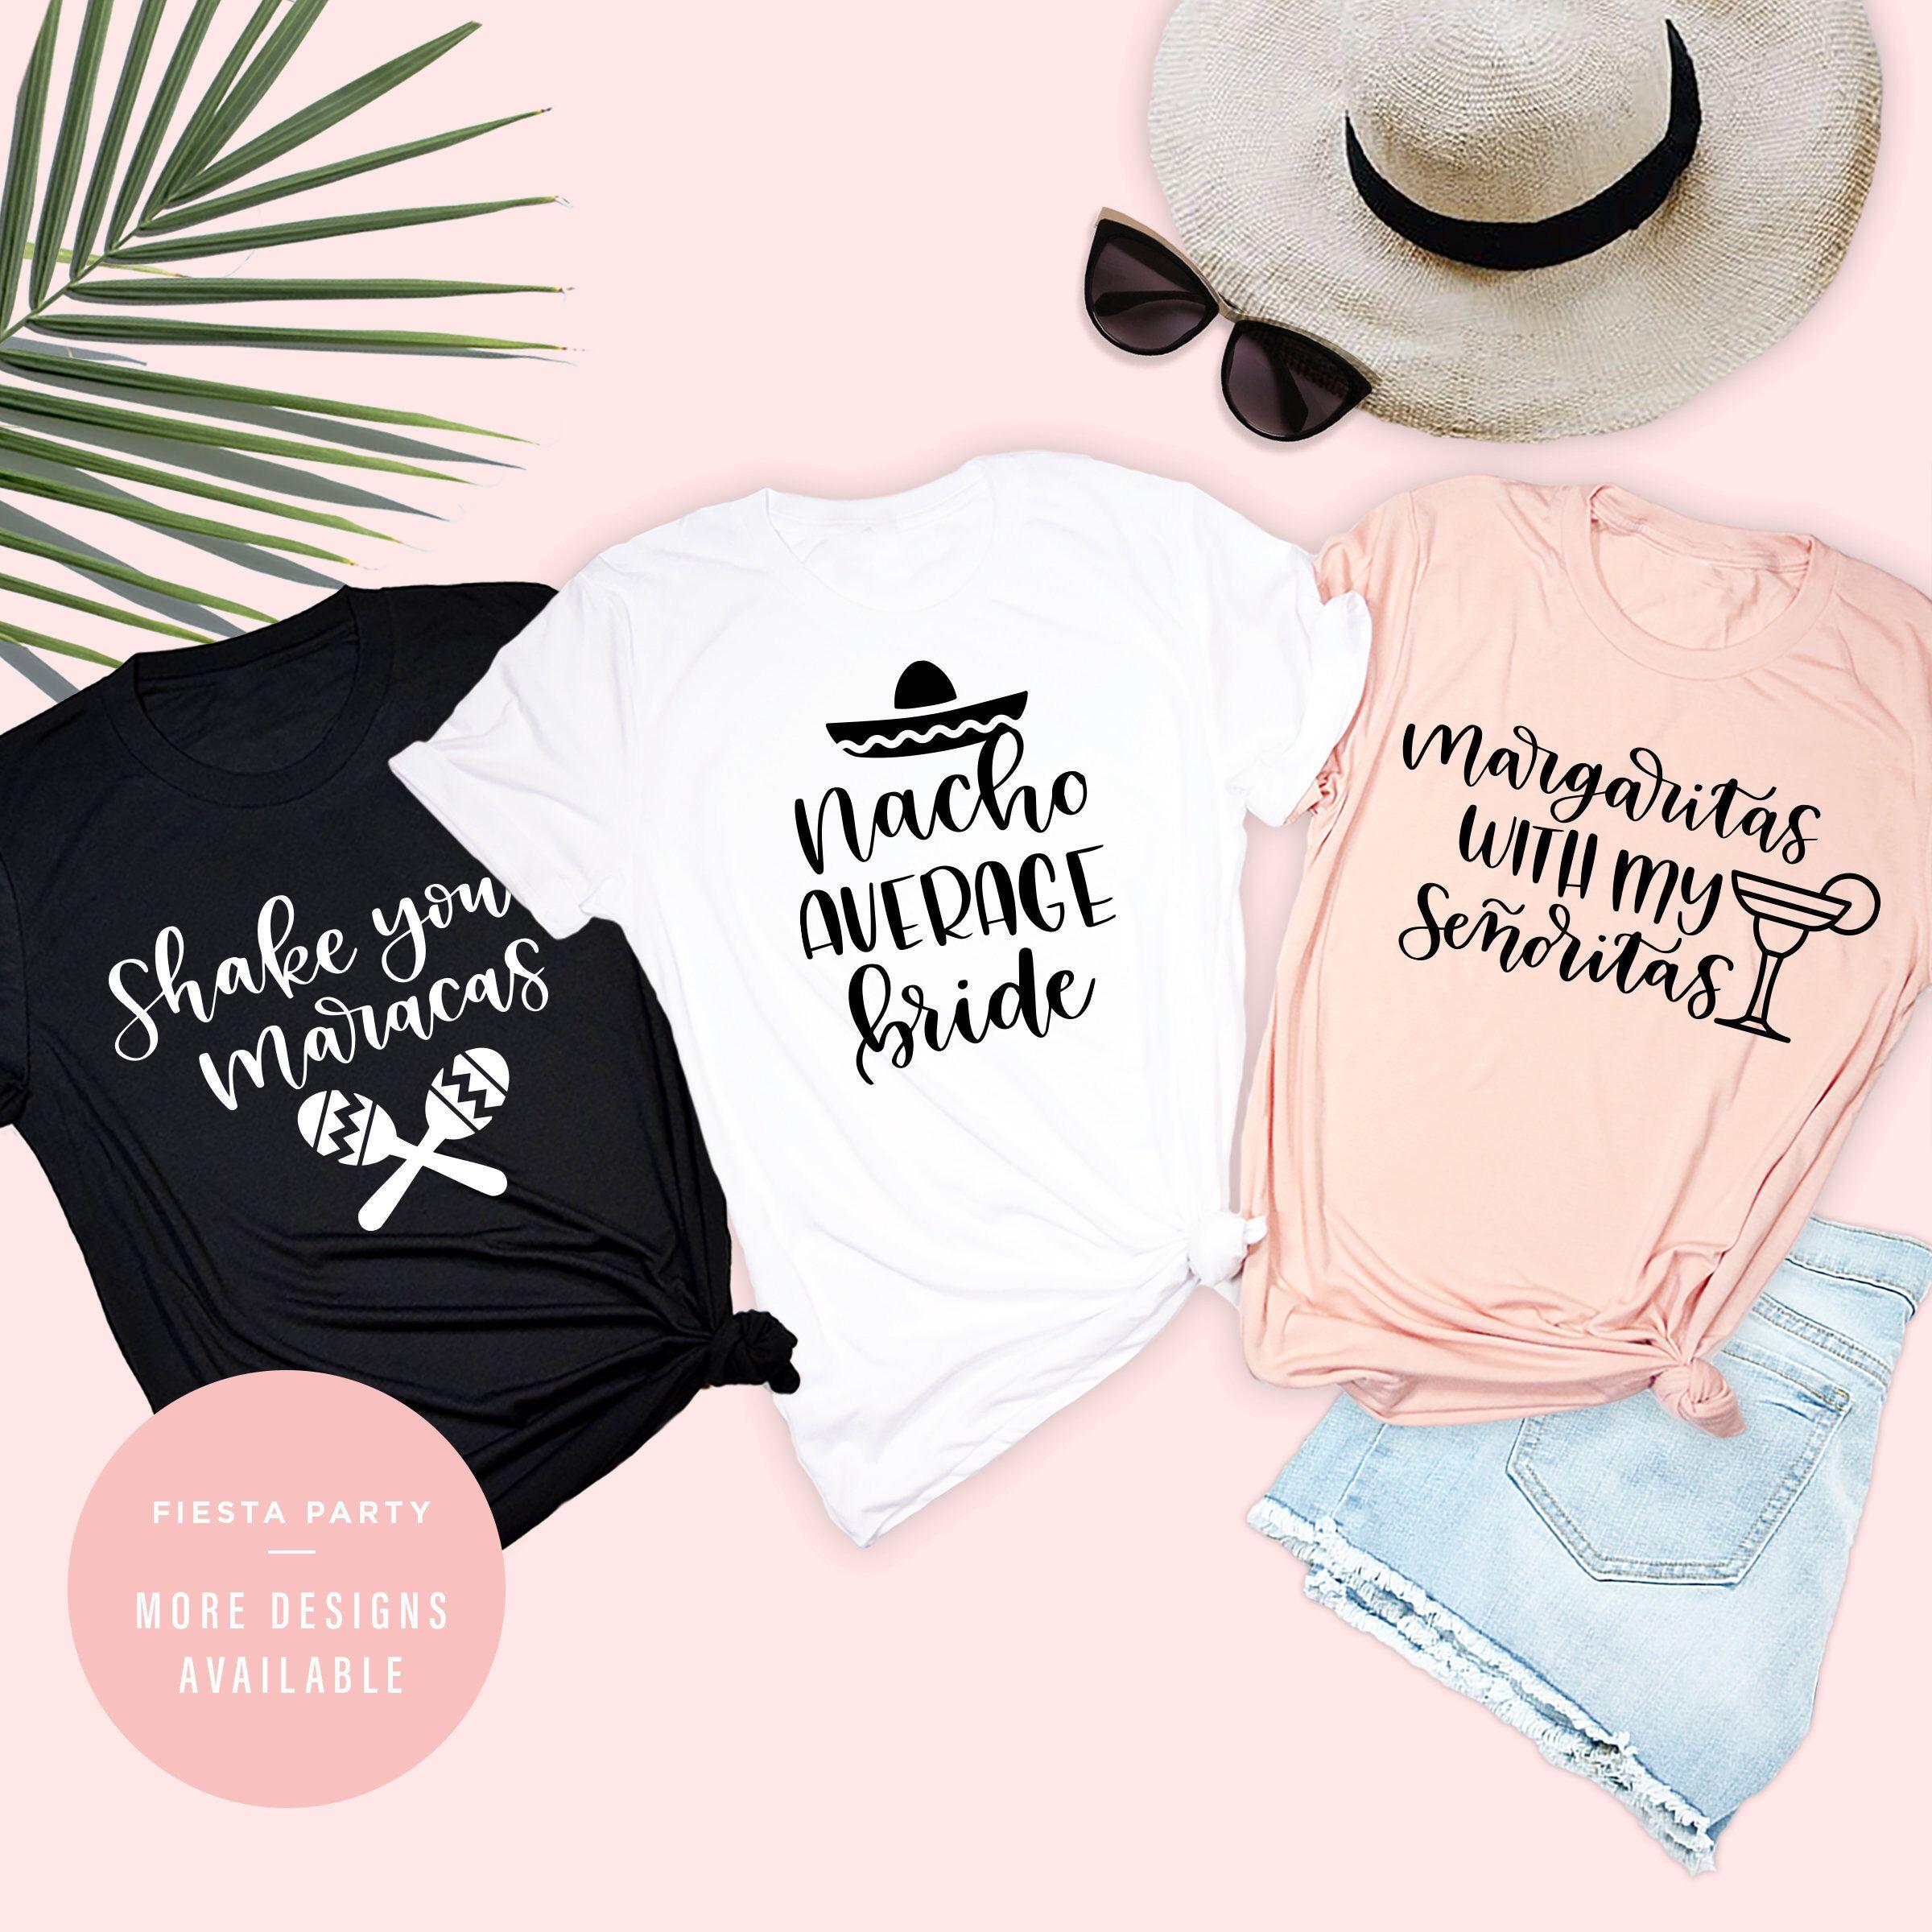 75a2133be Fiesta Shirt, Fiesta Siesta, Tequila Repeat, Fiesta Bachelorette,  Bachelorette Party Shirts,